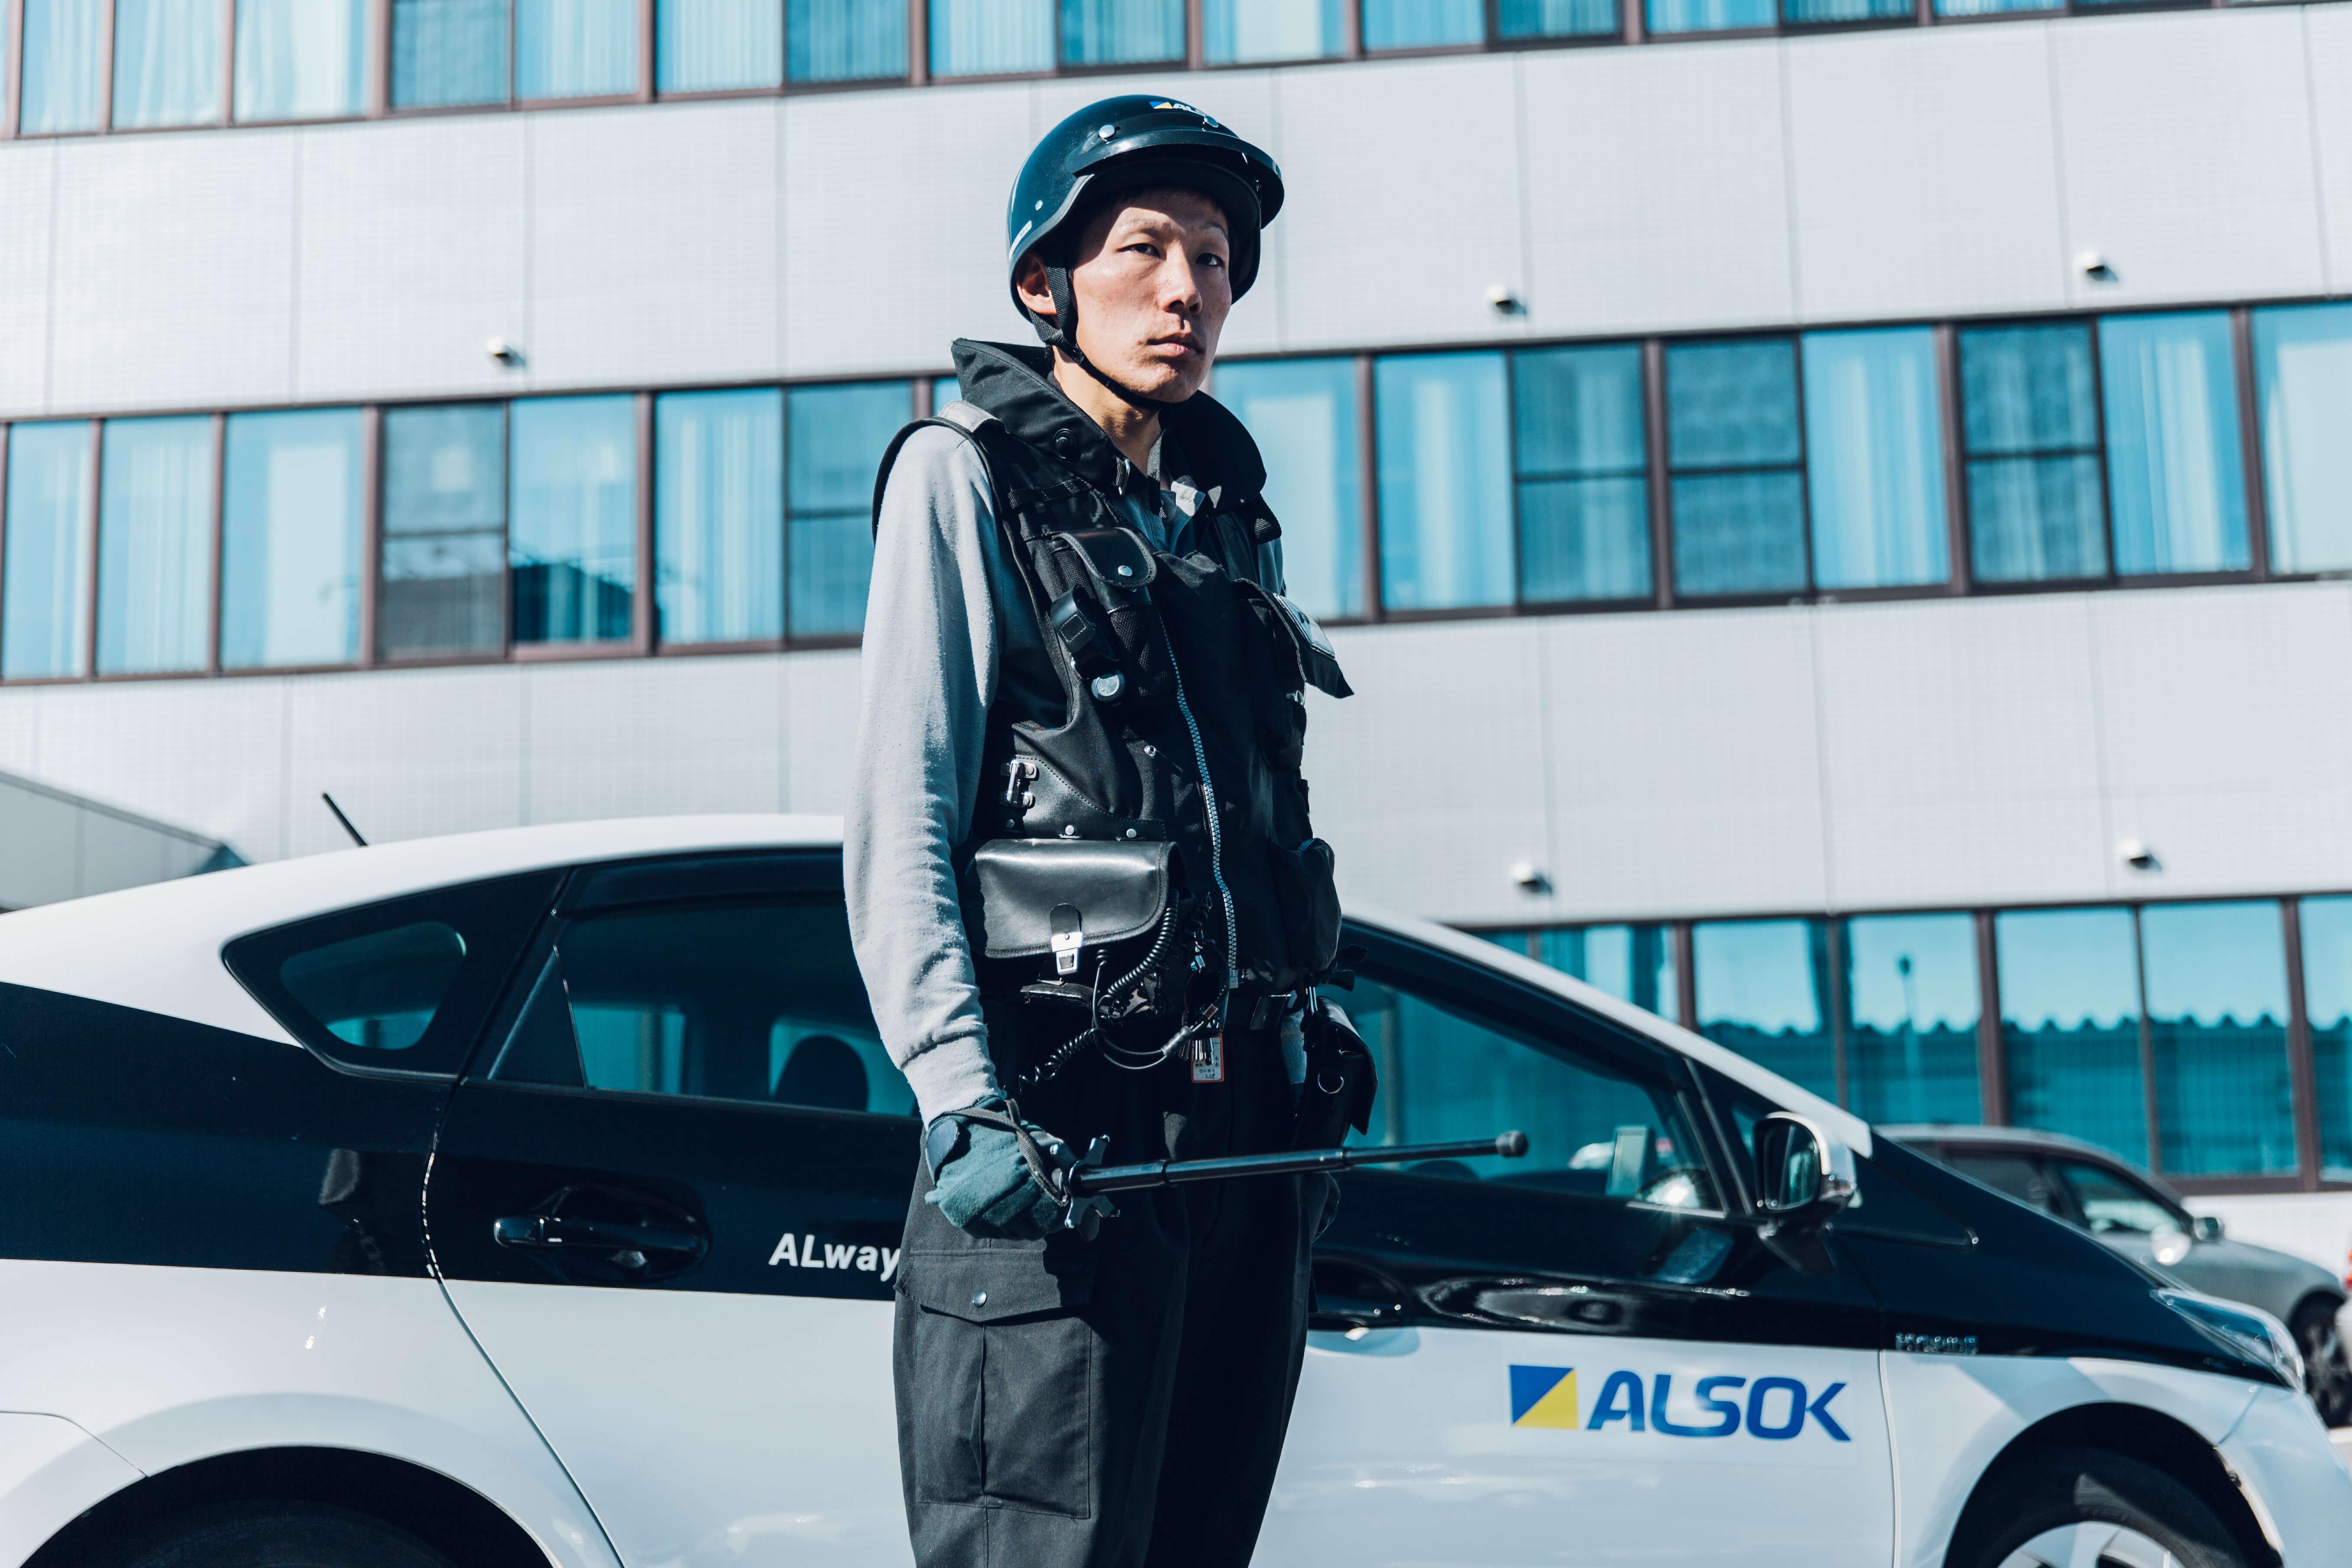 ALSOK福島株式会社